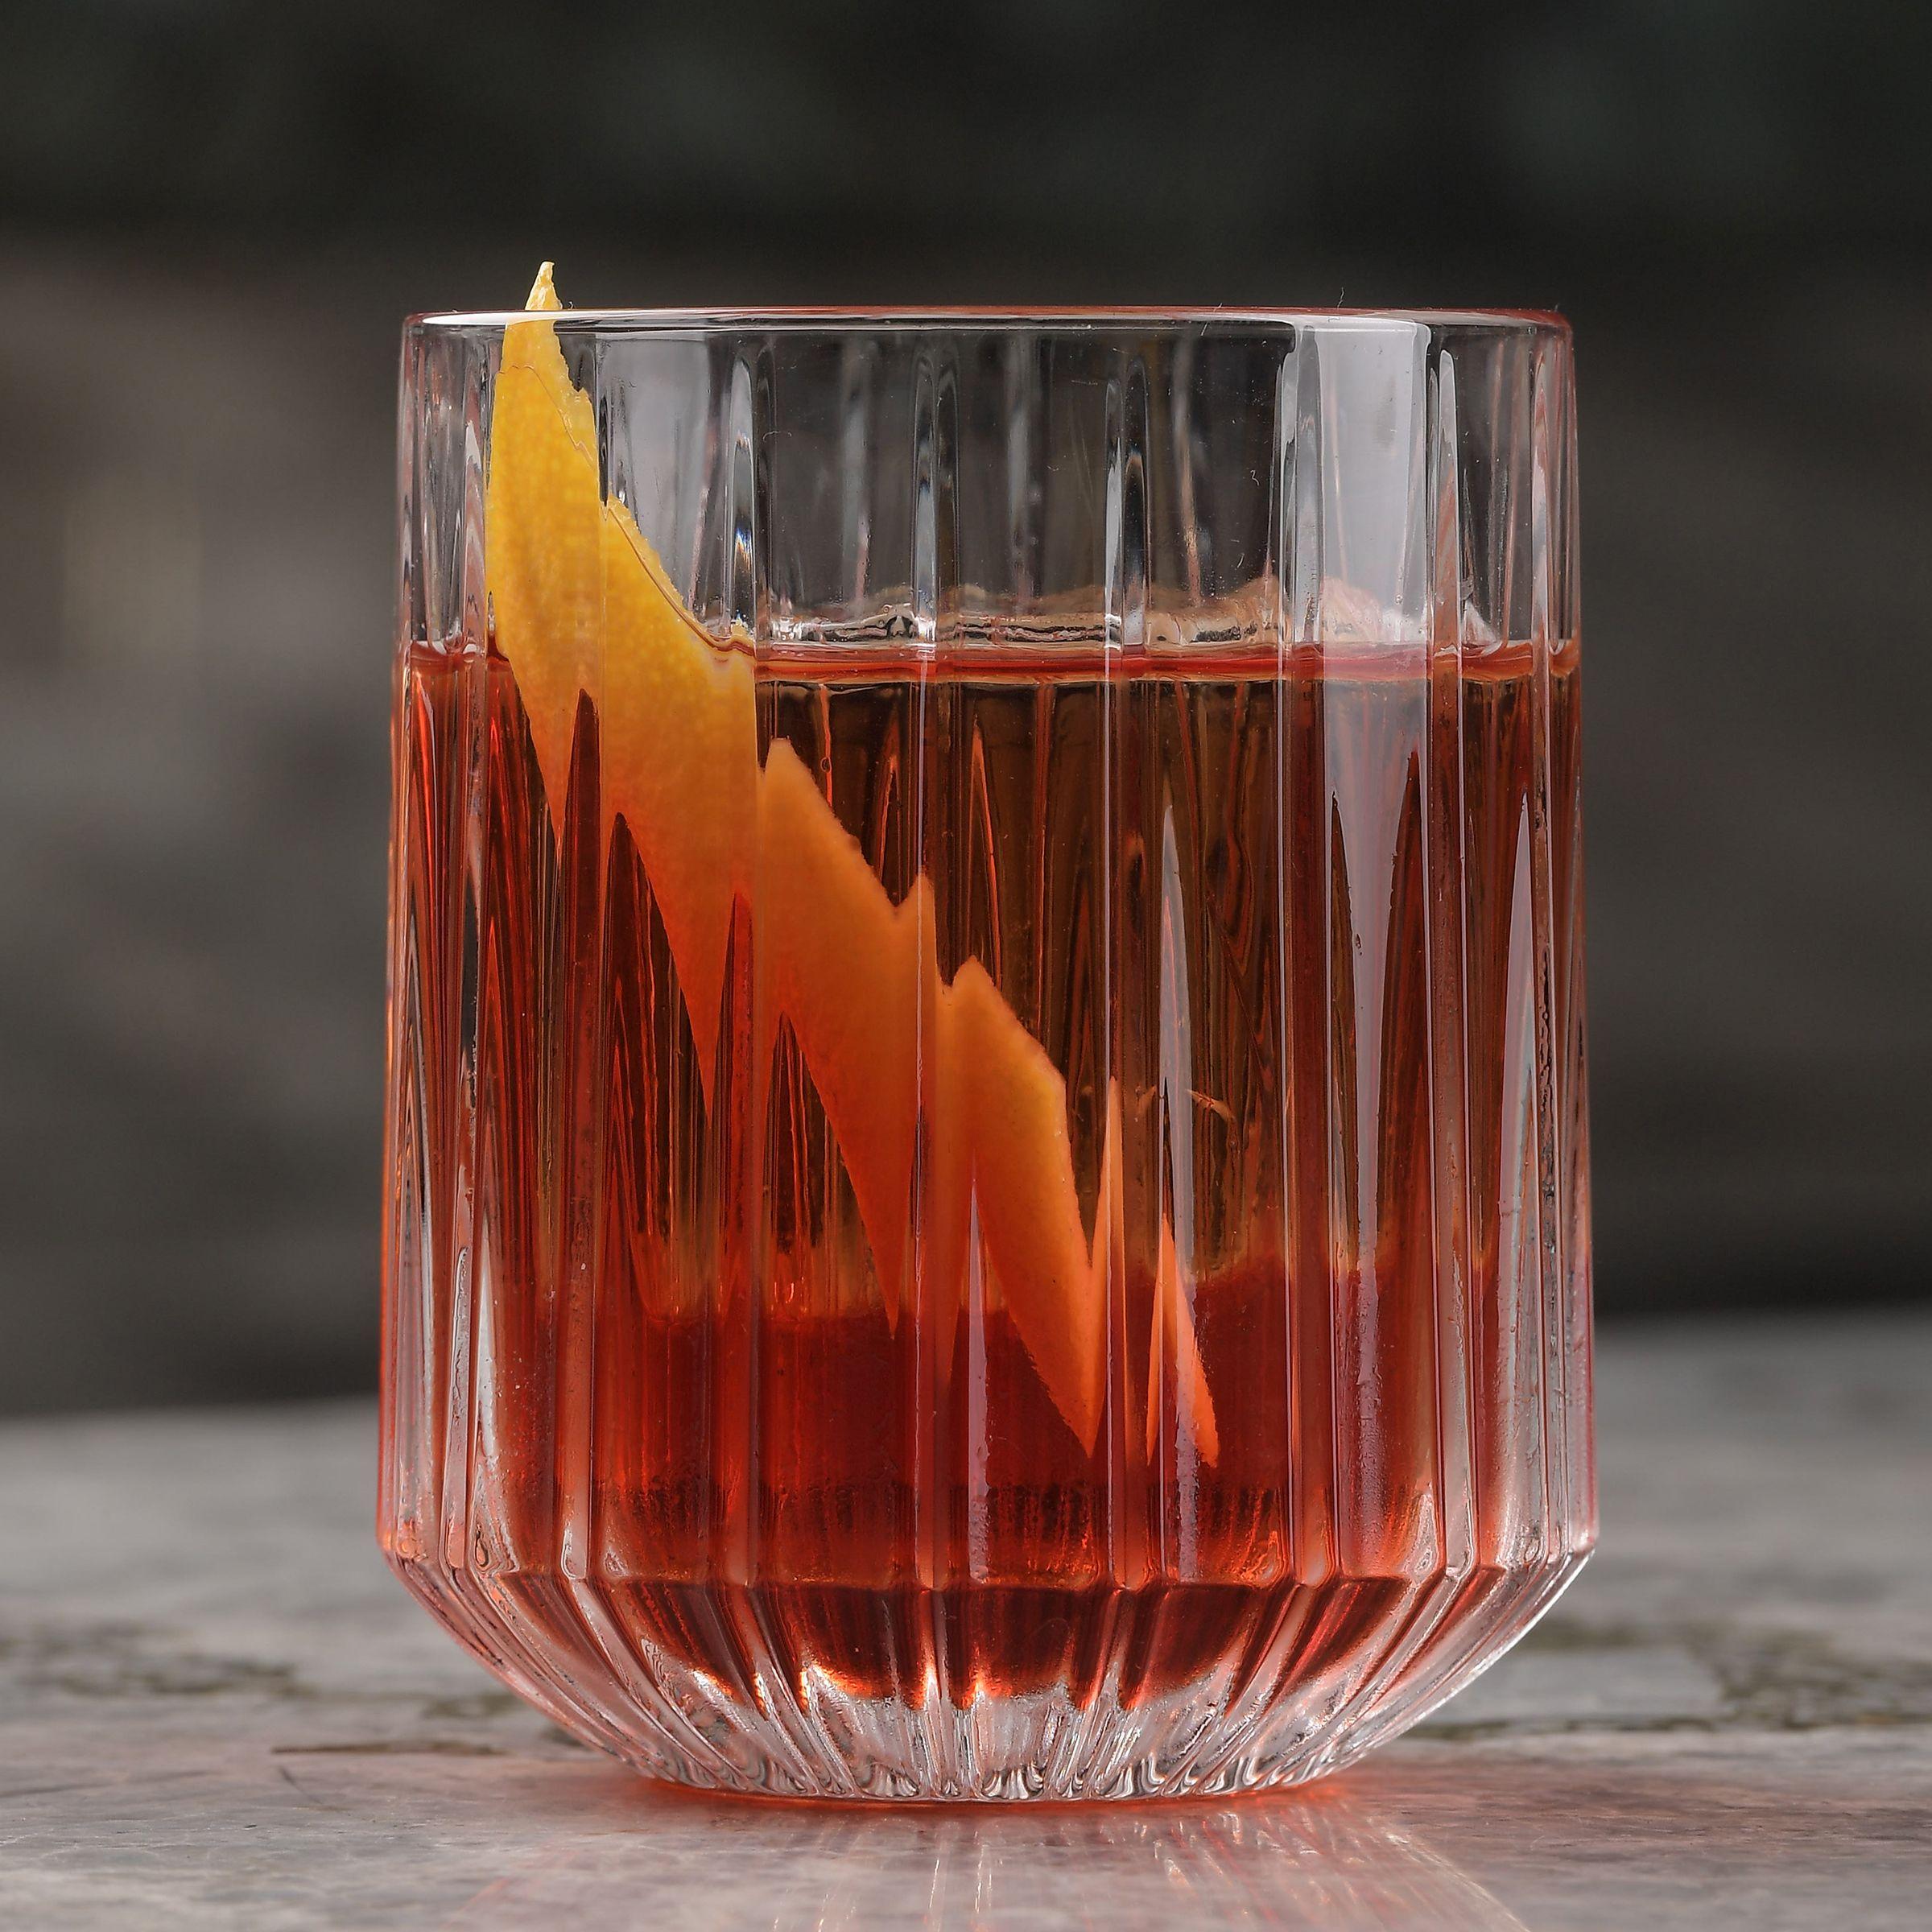 Enjoy Citrus Forward Classic American Cocktails photo